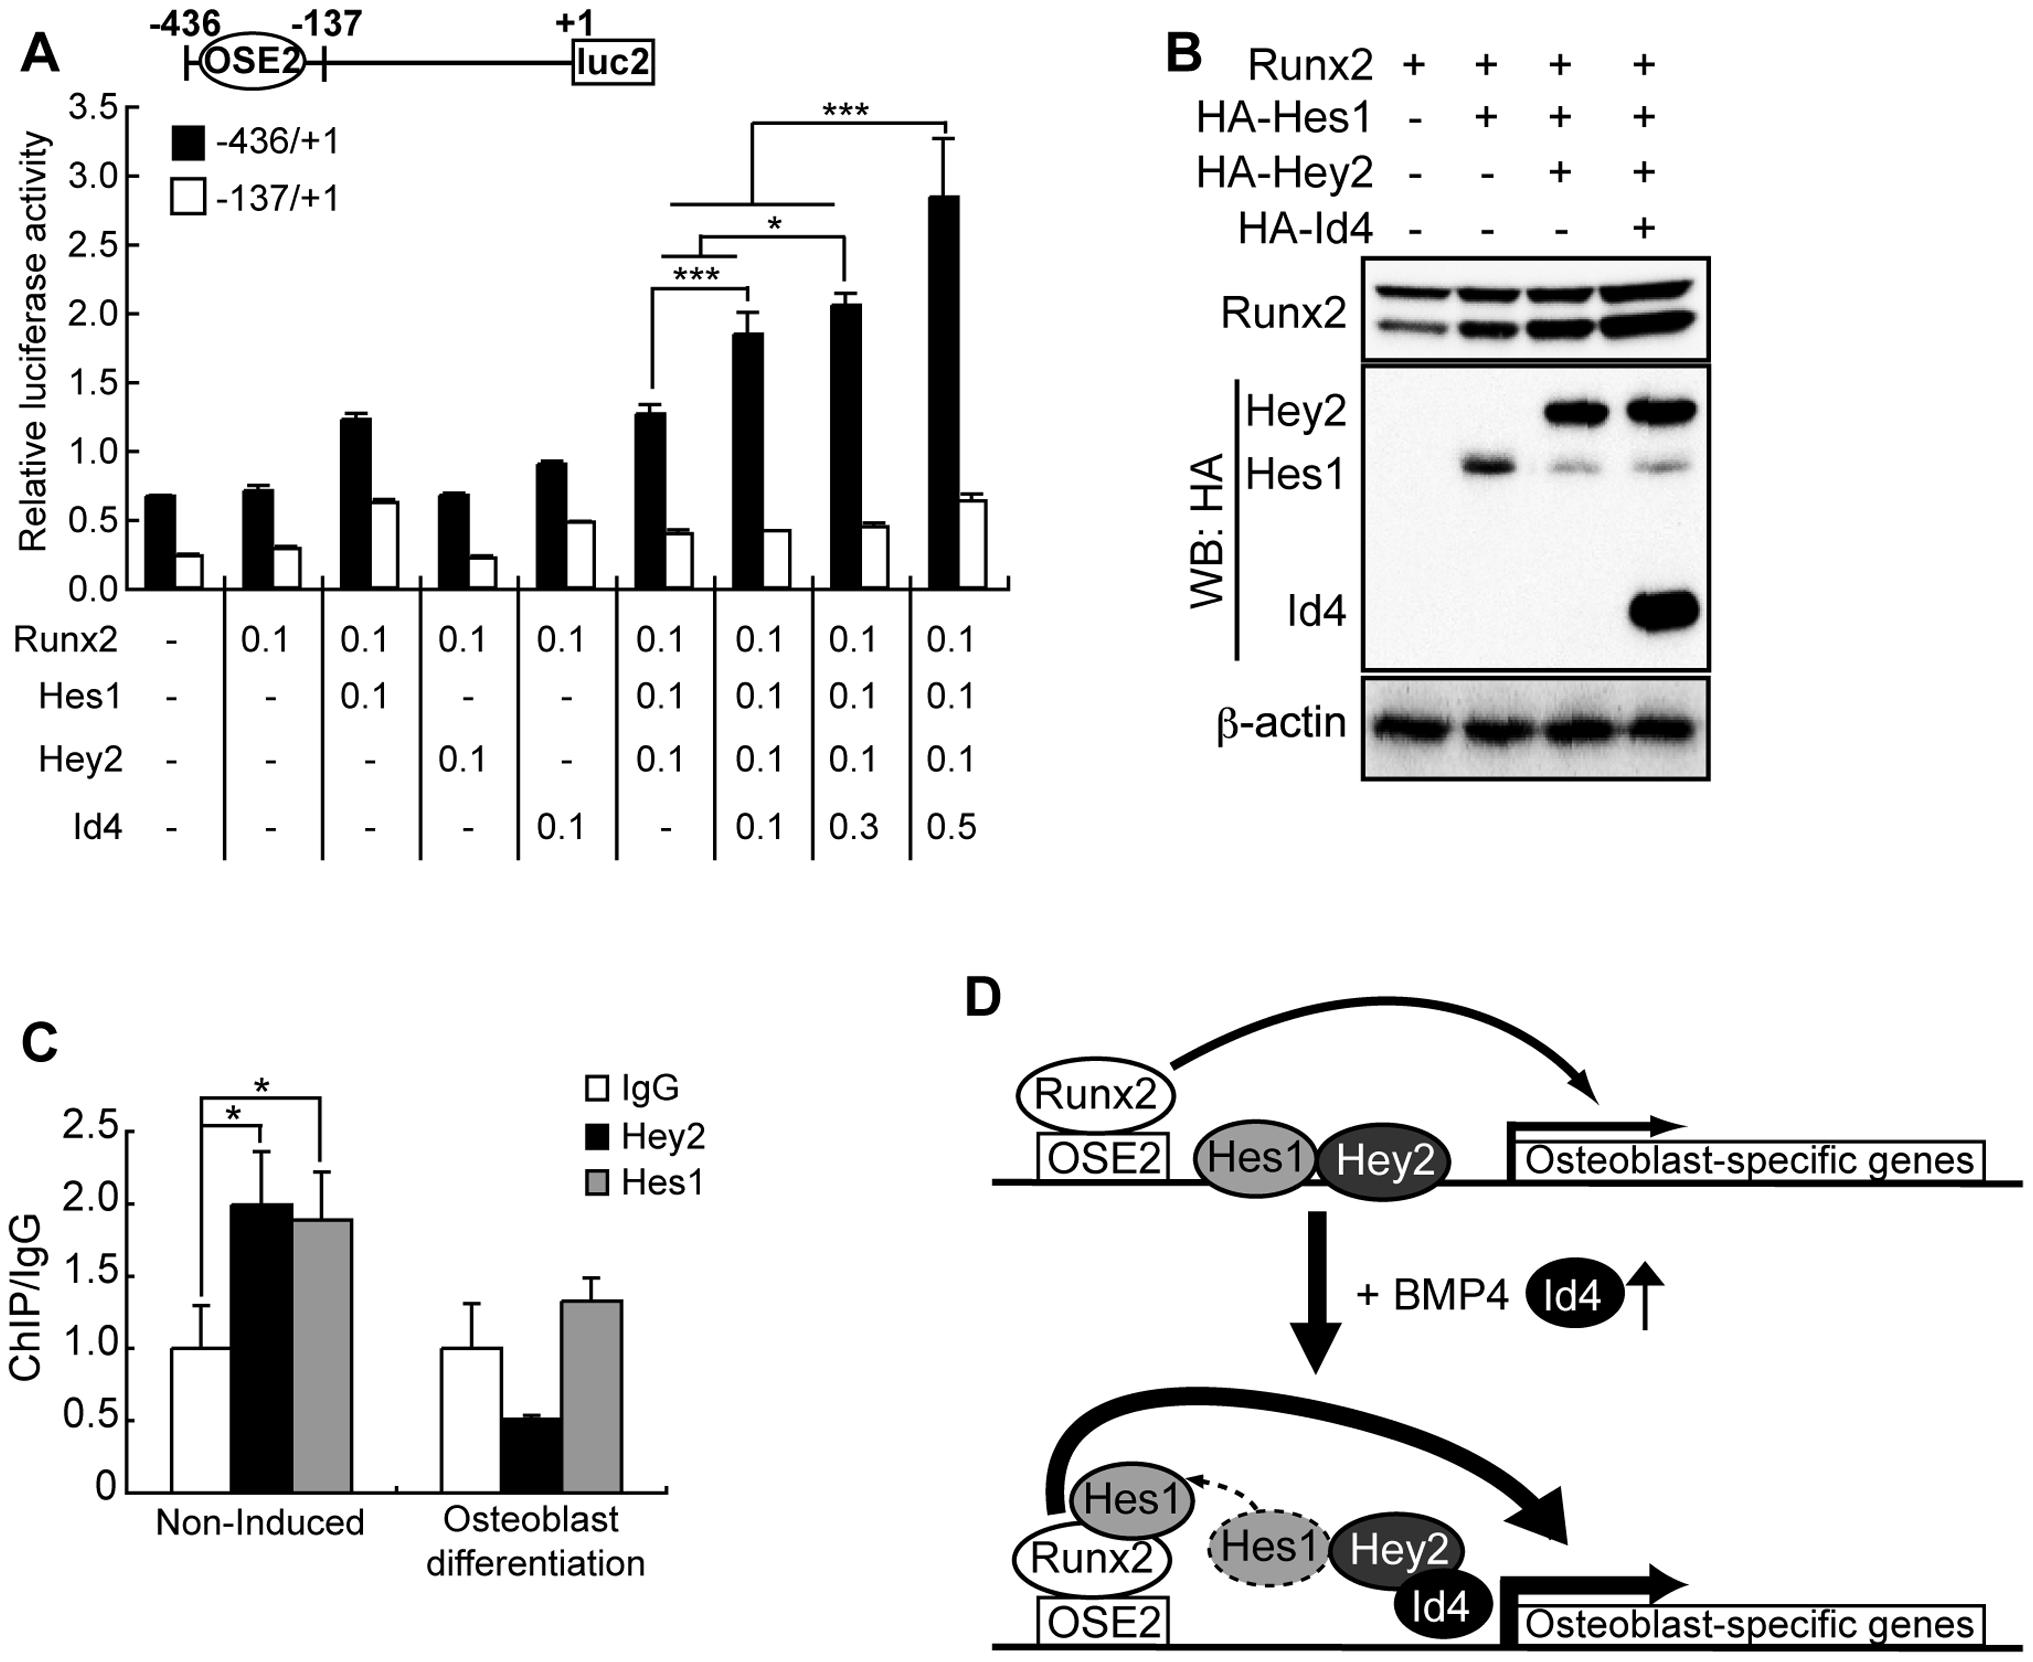 Id4 enhanced Runx2 transcriptional activity through stabilization of Runx2 protein.